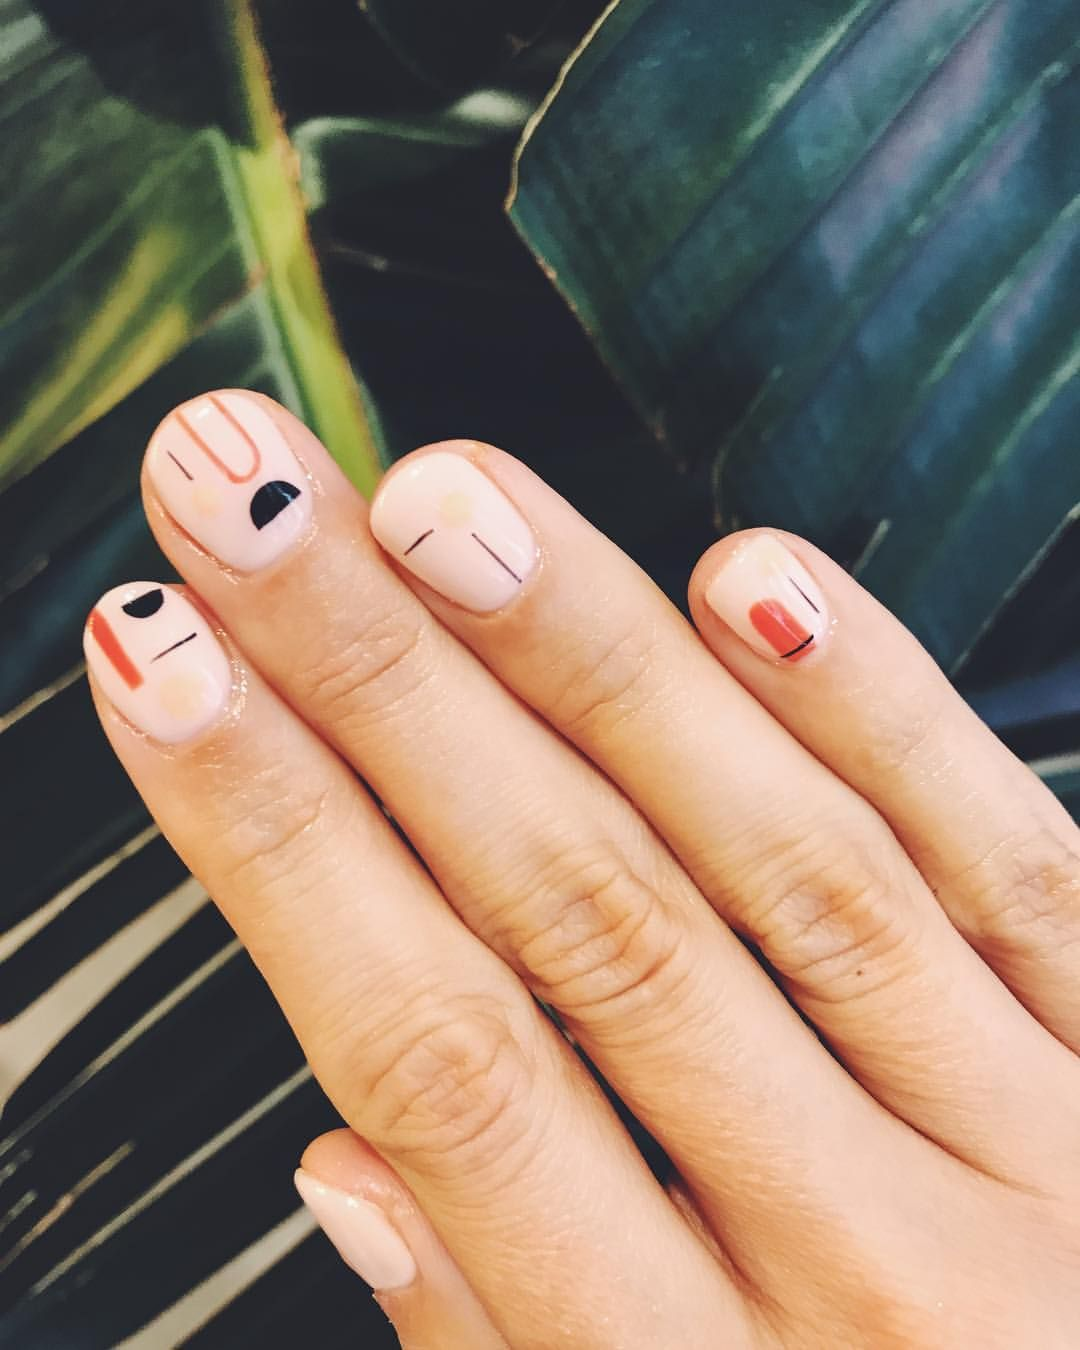 Pin by Dana Matthews on nails | Pinterest | Nail art, Nails and A mod